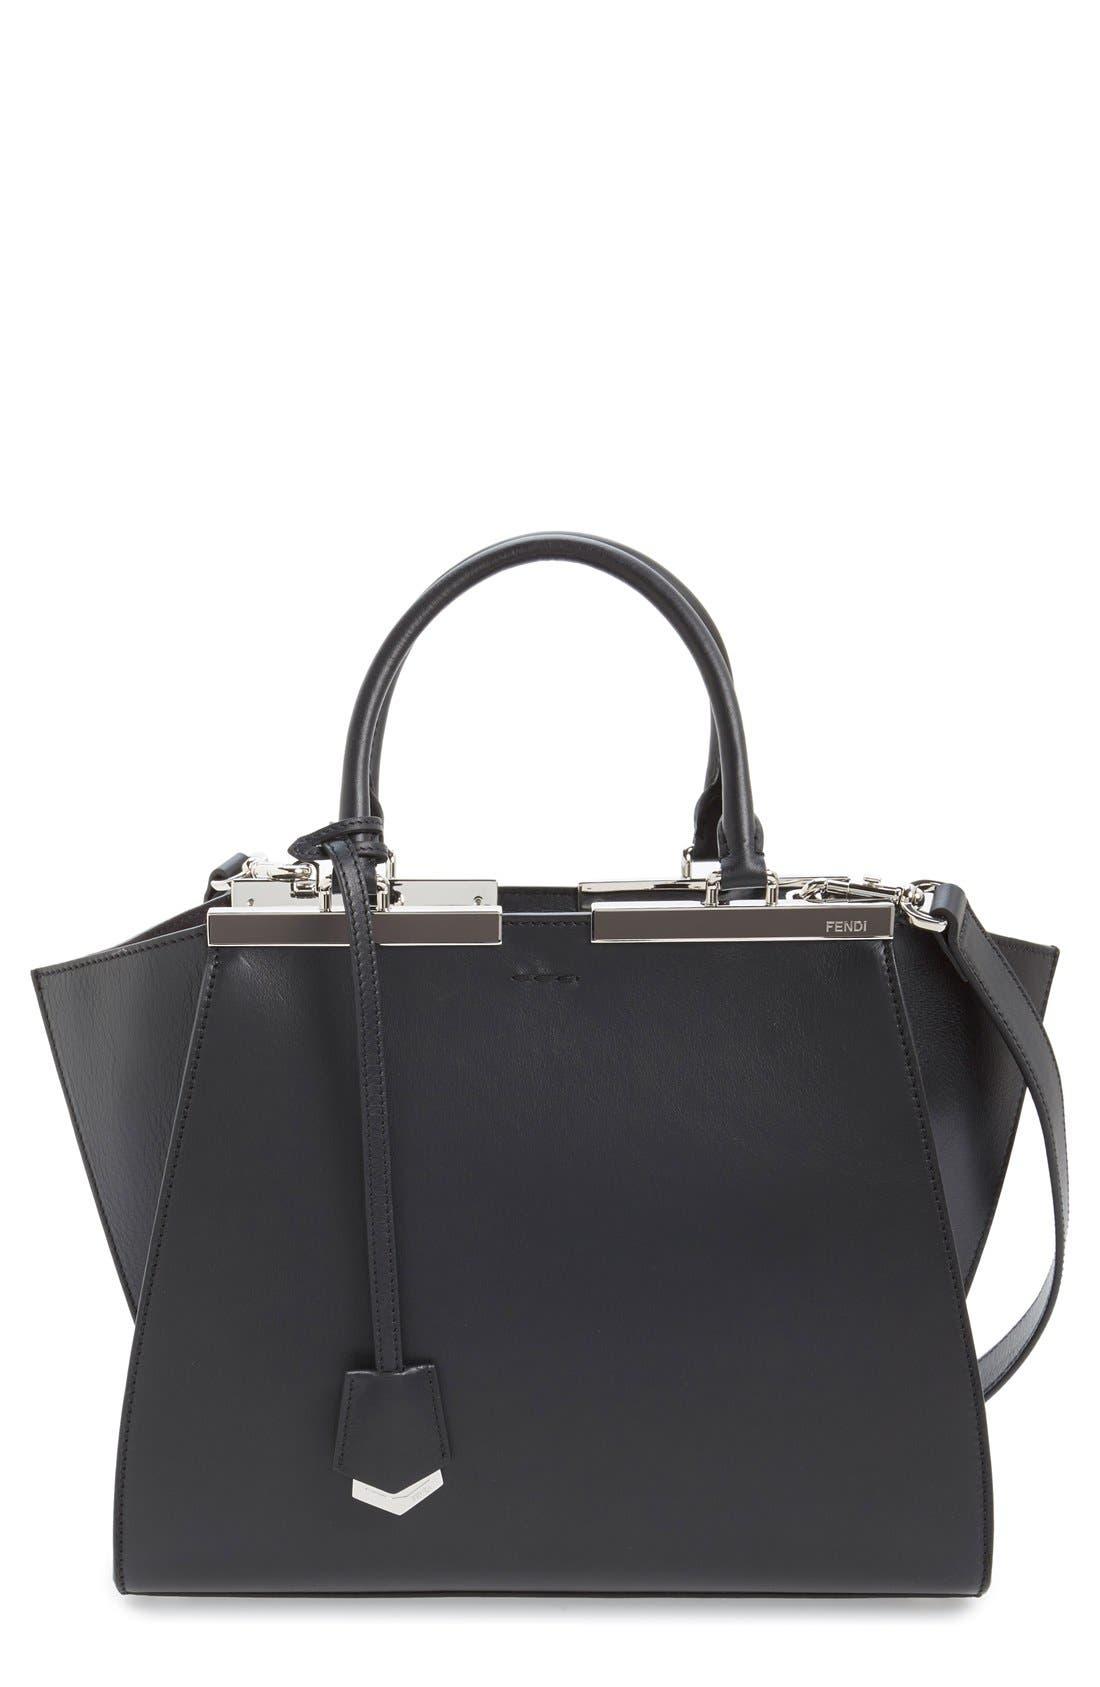 9bc3671c509c where to buy fendi trois jour mini shopping tote bag black white 9a6c0 9f4aa